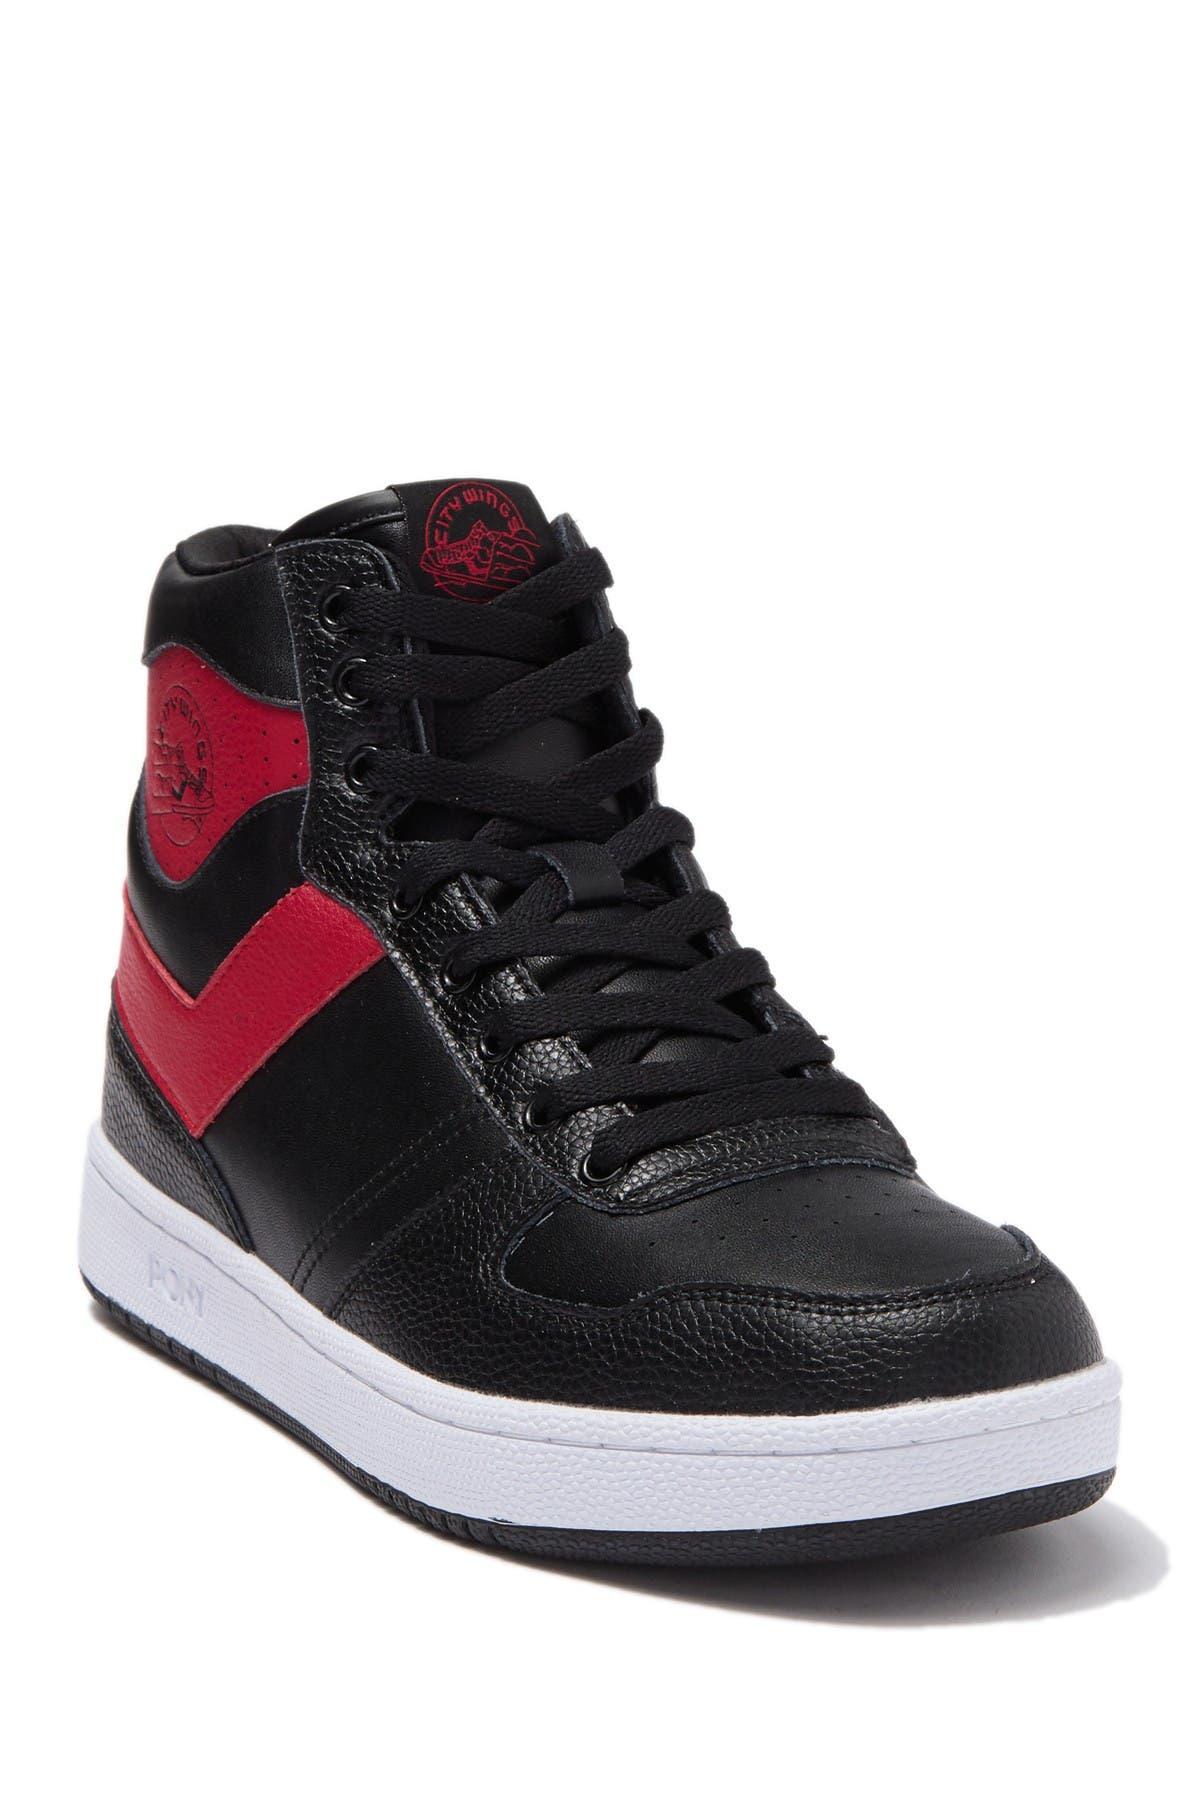 PONY | City Wings High Top Sneaker